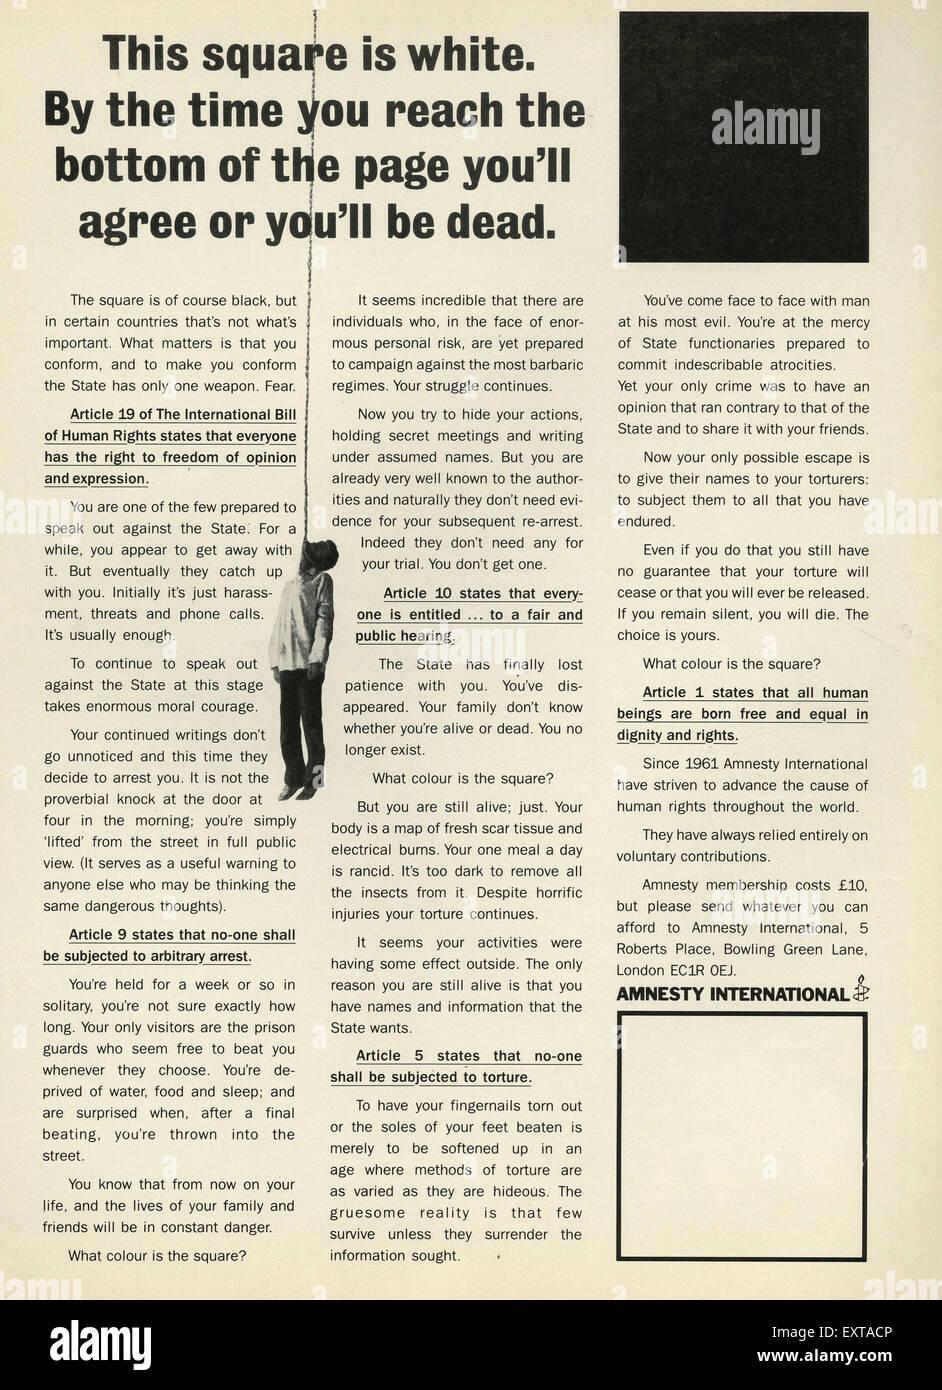 1980s UK Amnesty International Magazine Advert Stock Photo